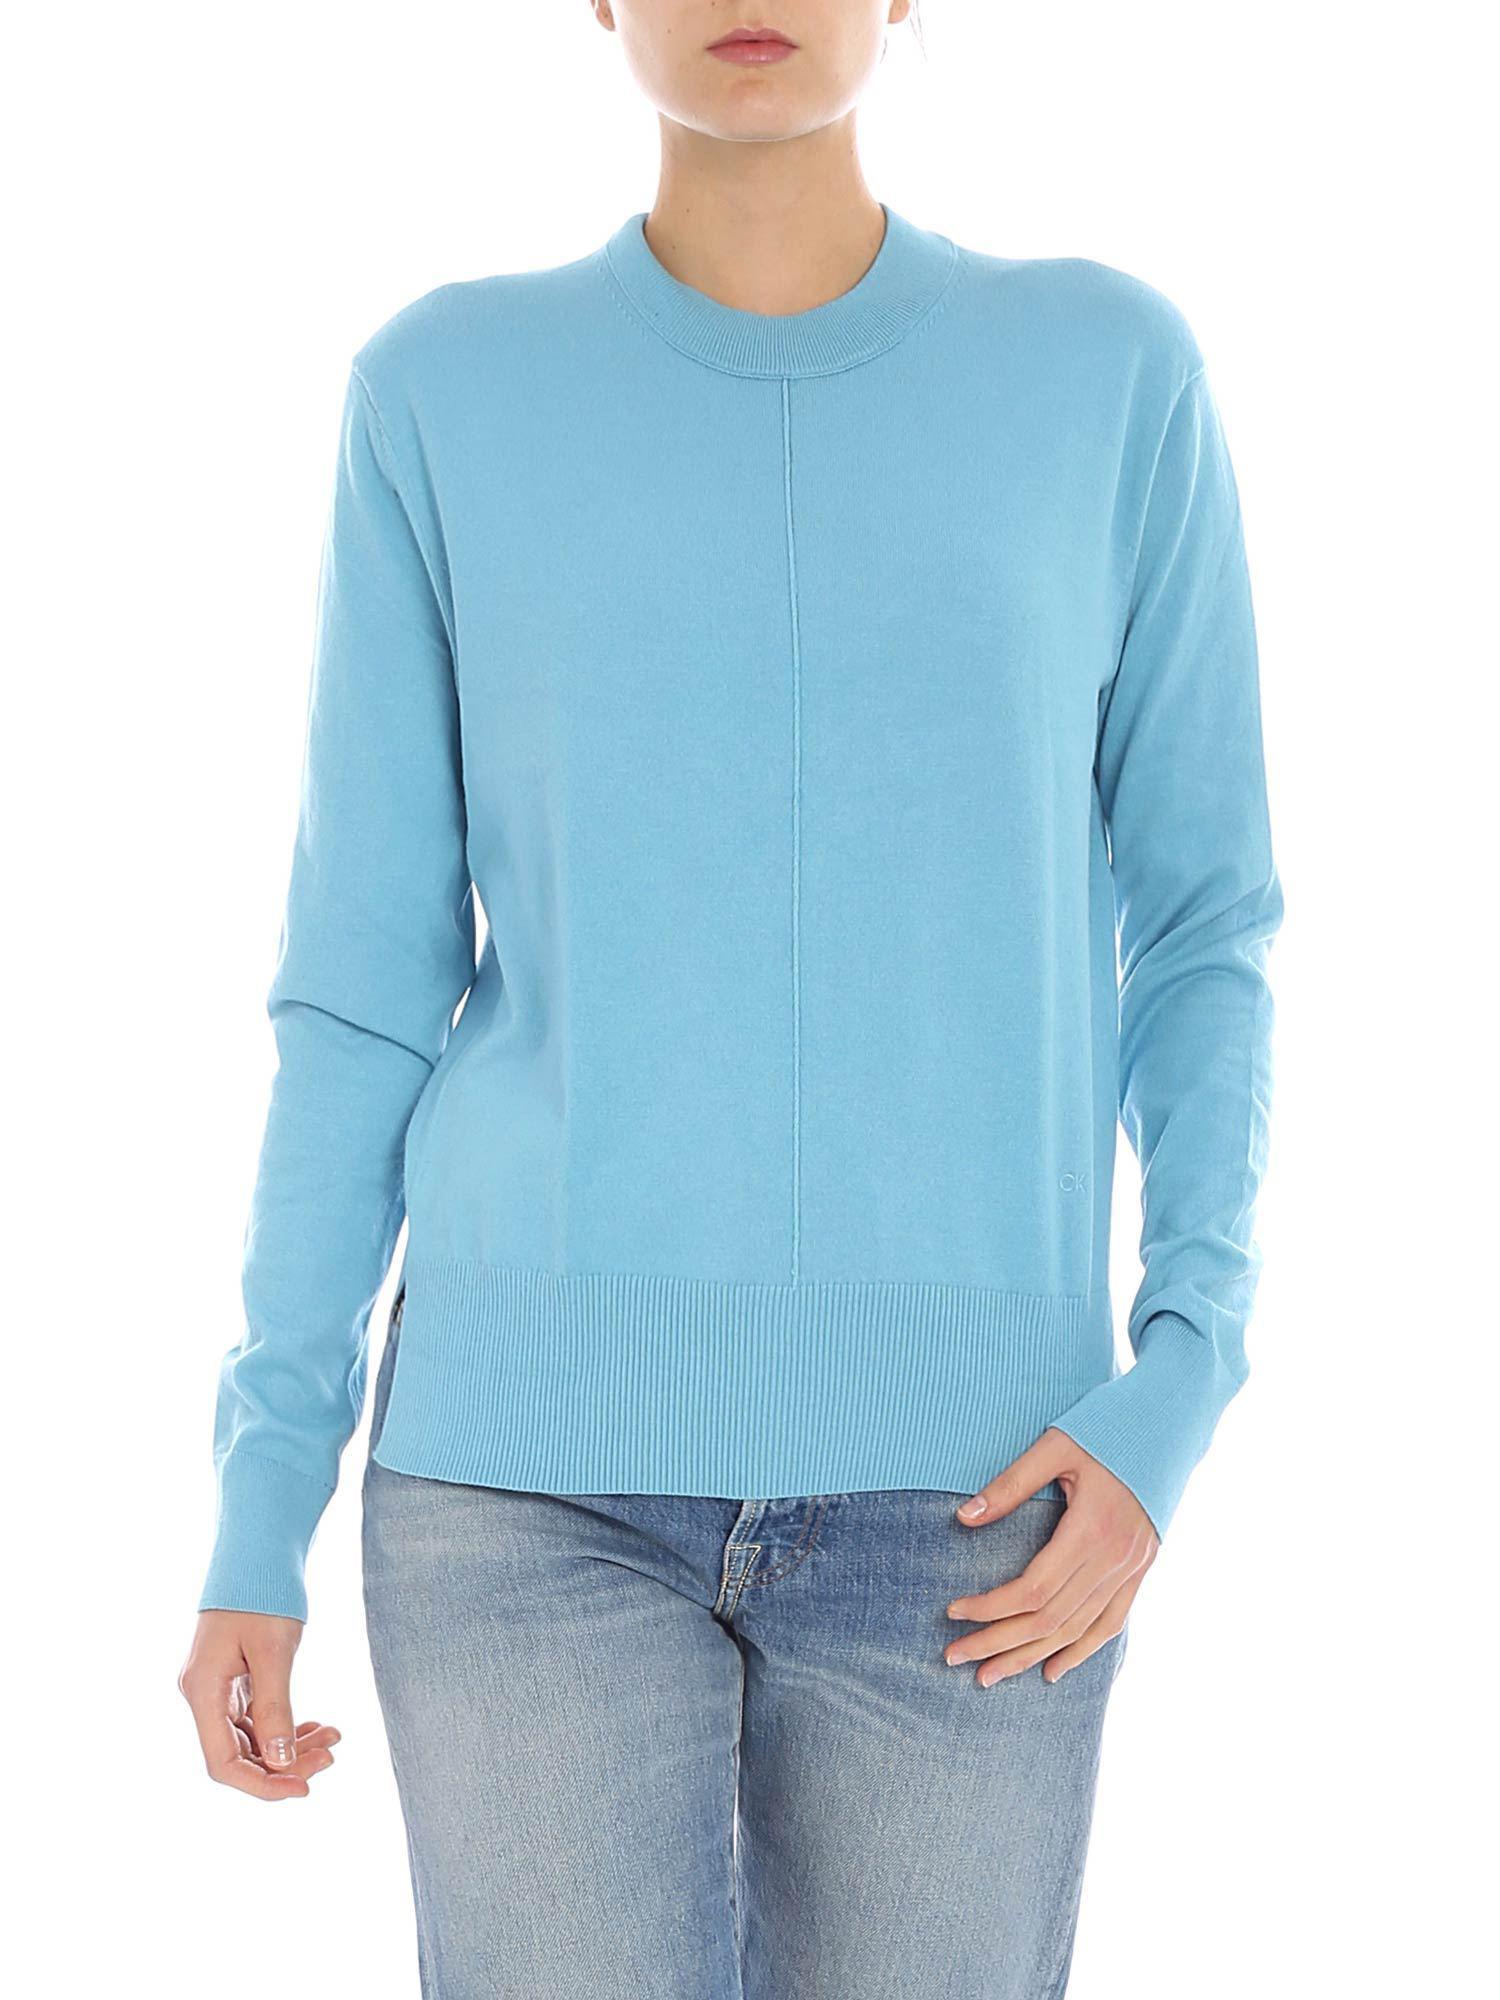 325319c33534 Calvin Klein Light Blue Crew-neck Sweater With Seam in Blue - Lyst